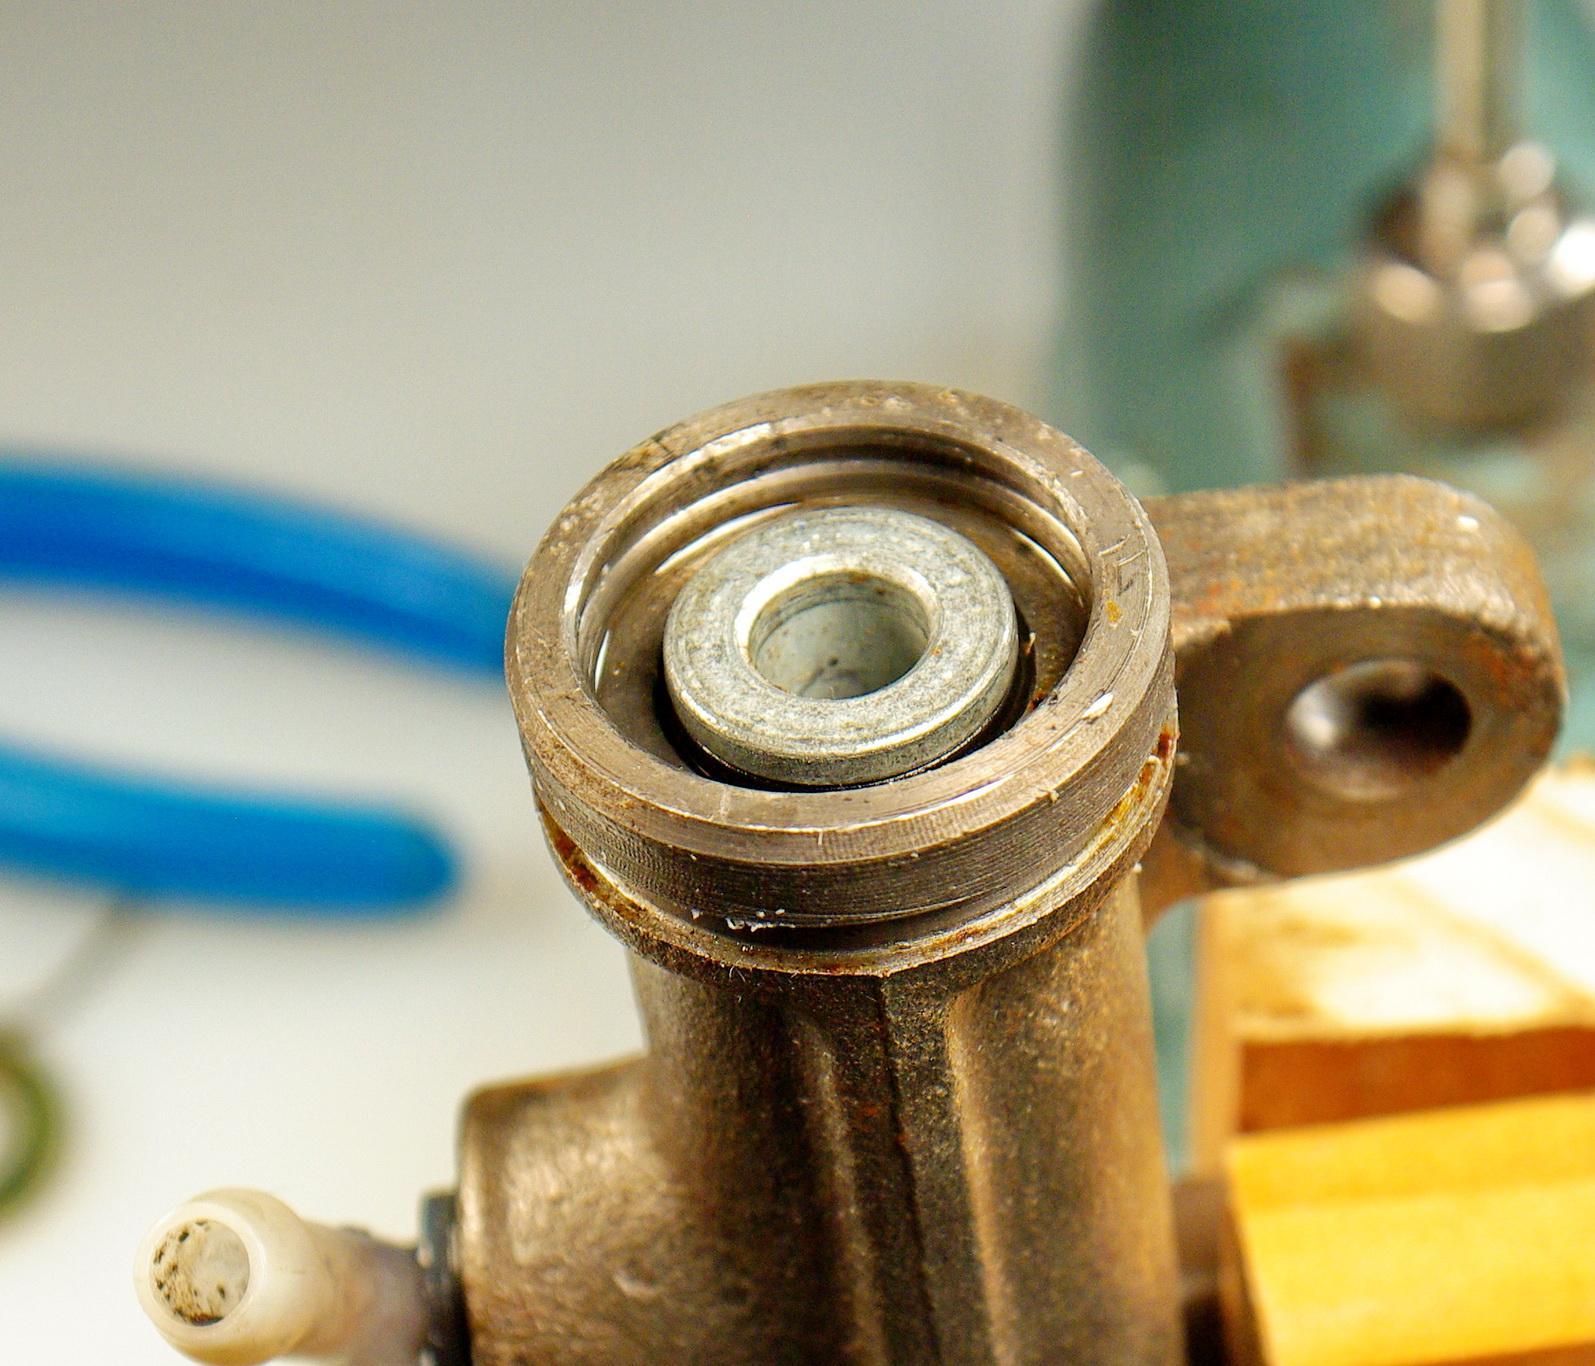 TheSamba com :: 411/412 - View topic - The RISK of NOS brake